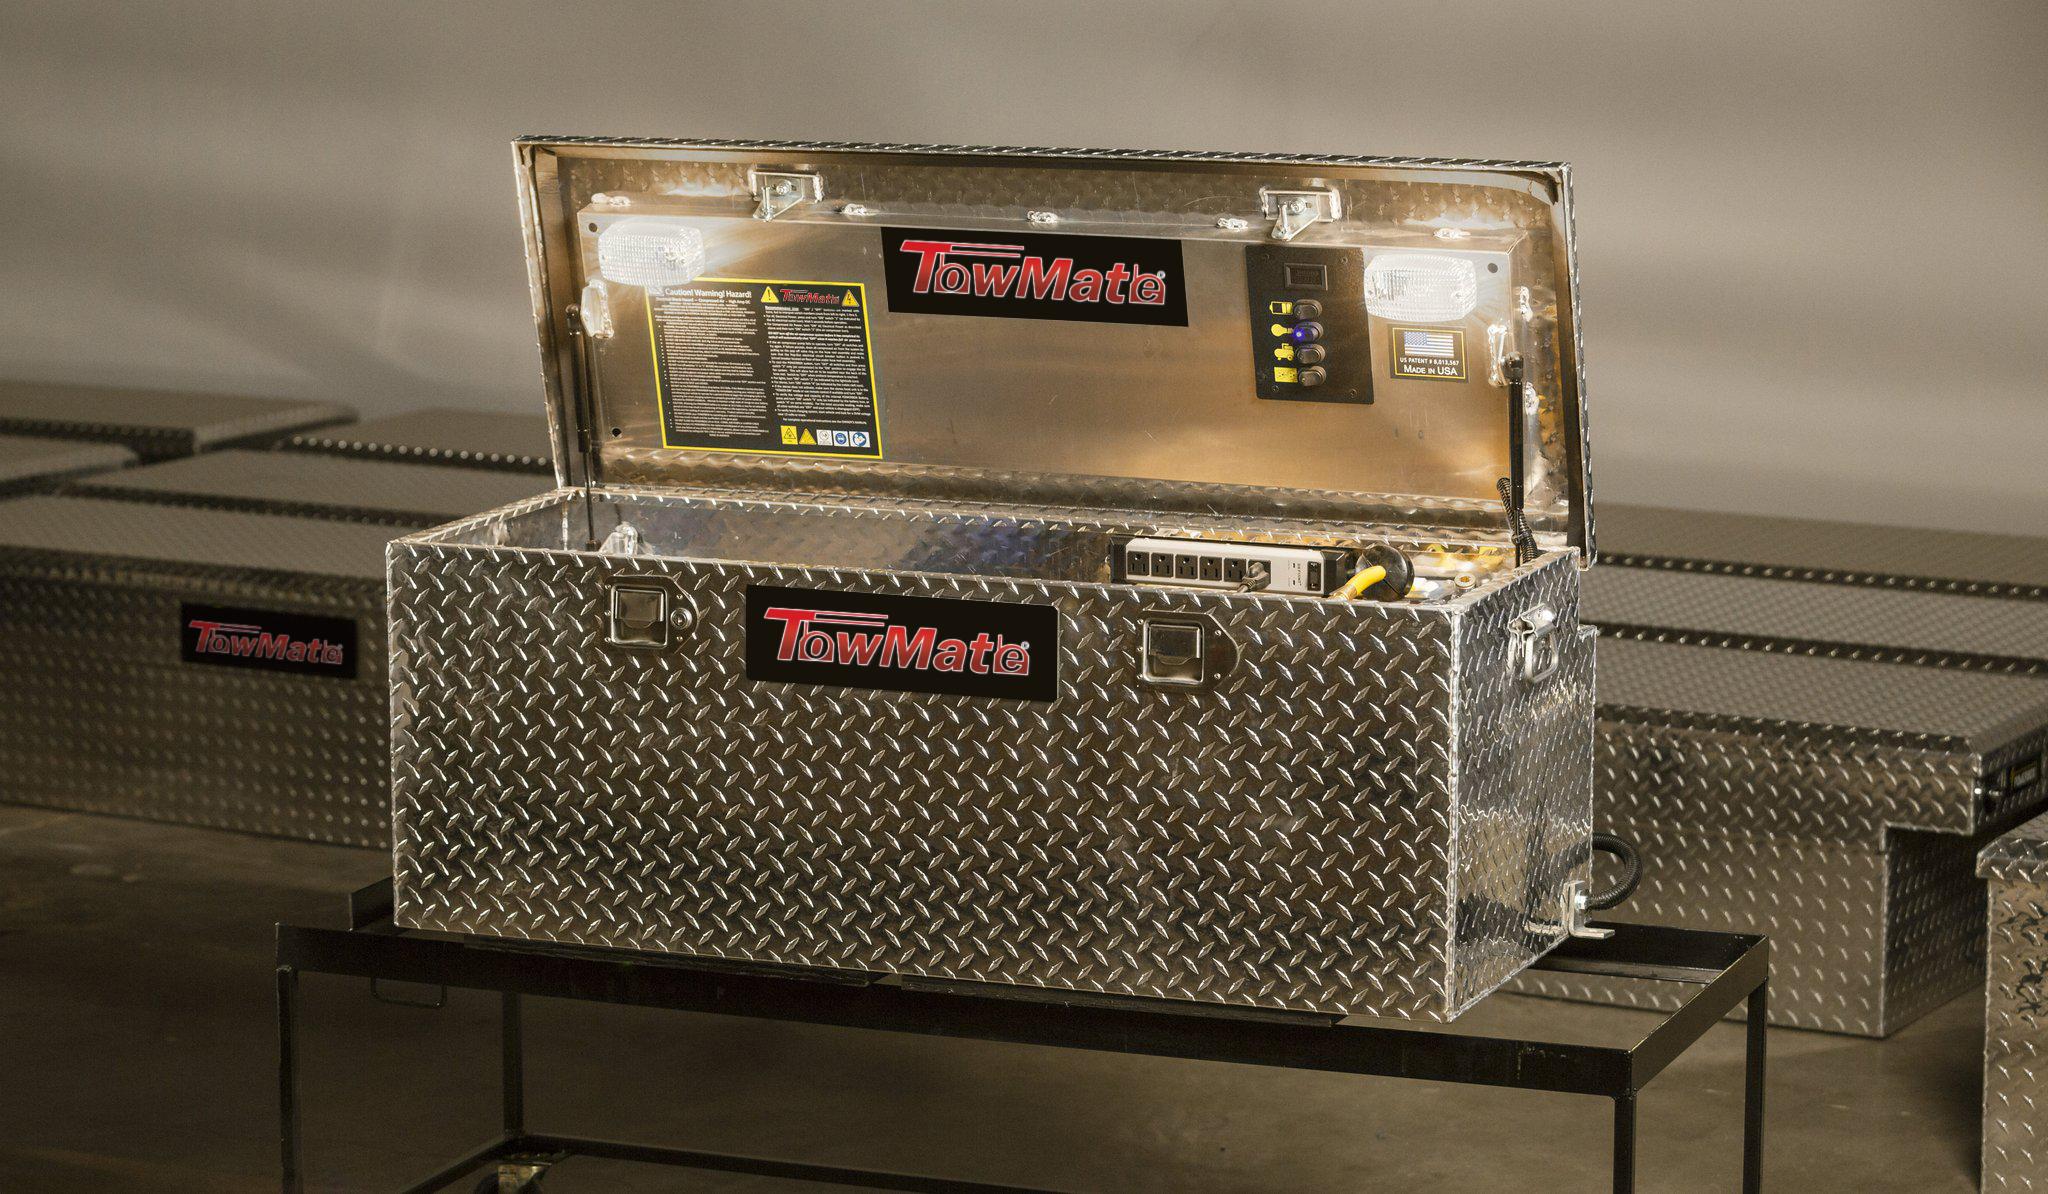 VoltMate PRO CHST Premium Jump Starter Power Supply And Air